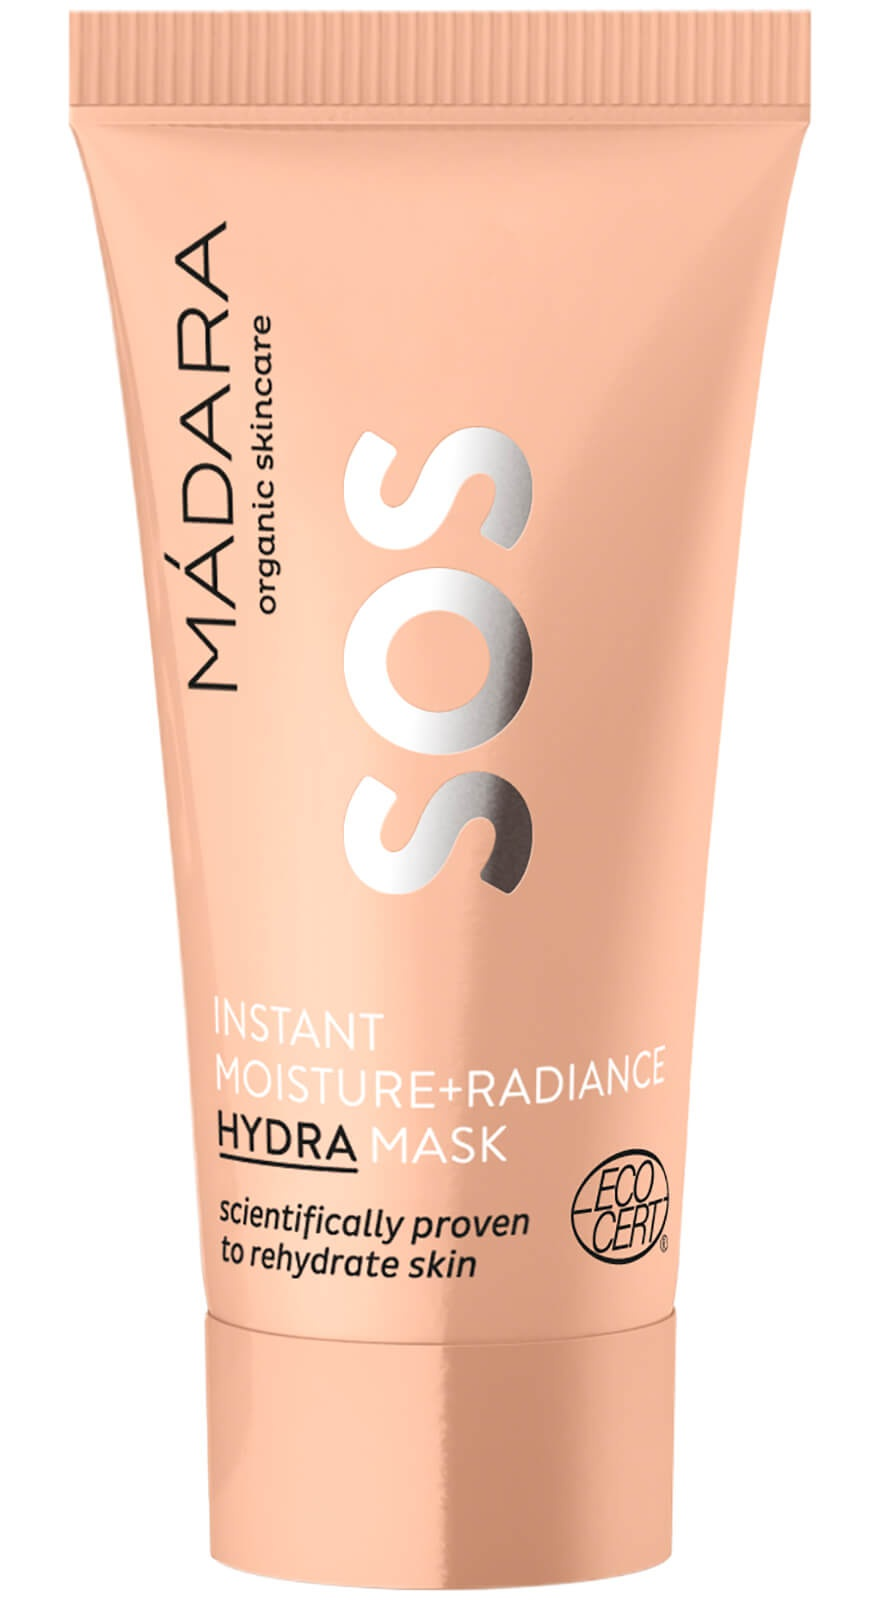 Madara Sos Hydra Moisture+Radiance Mask